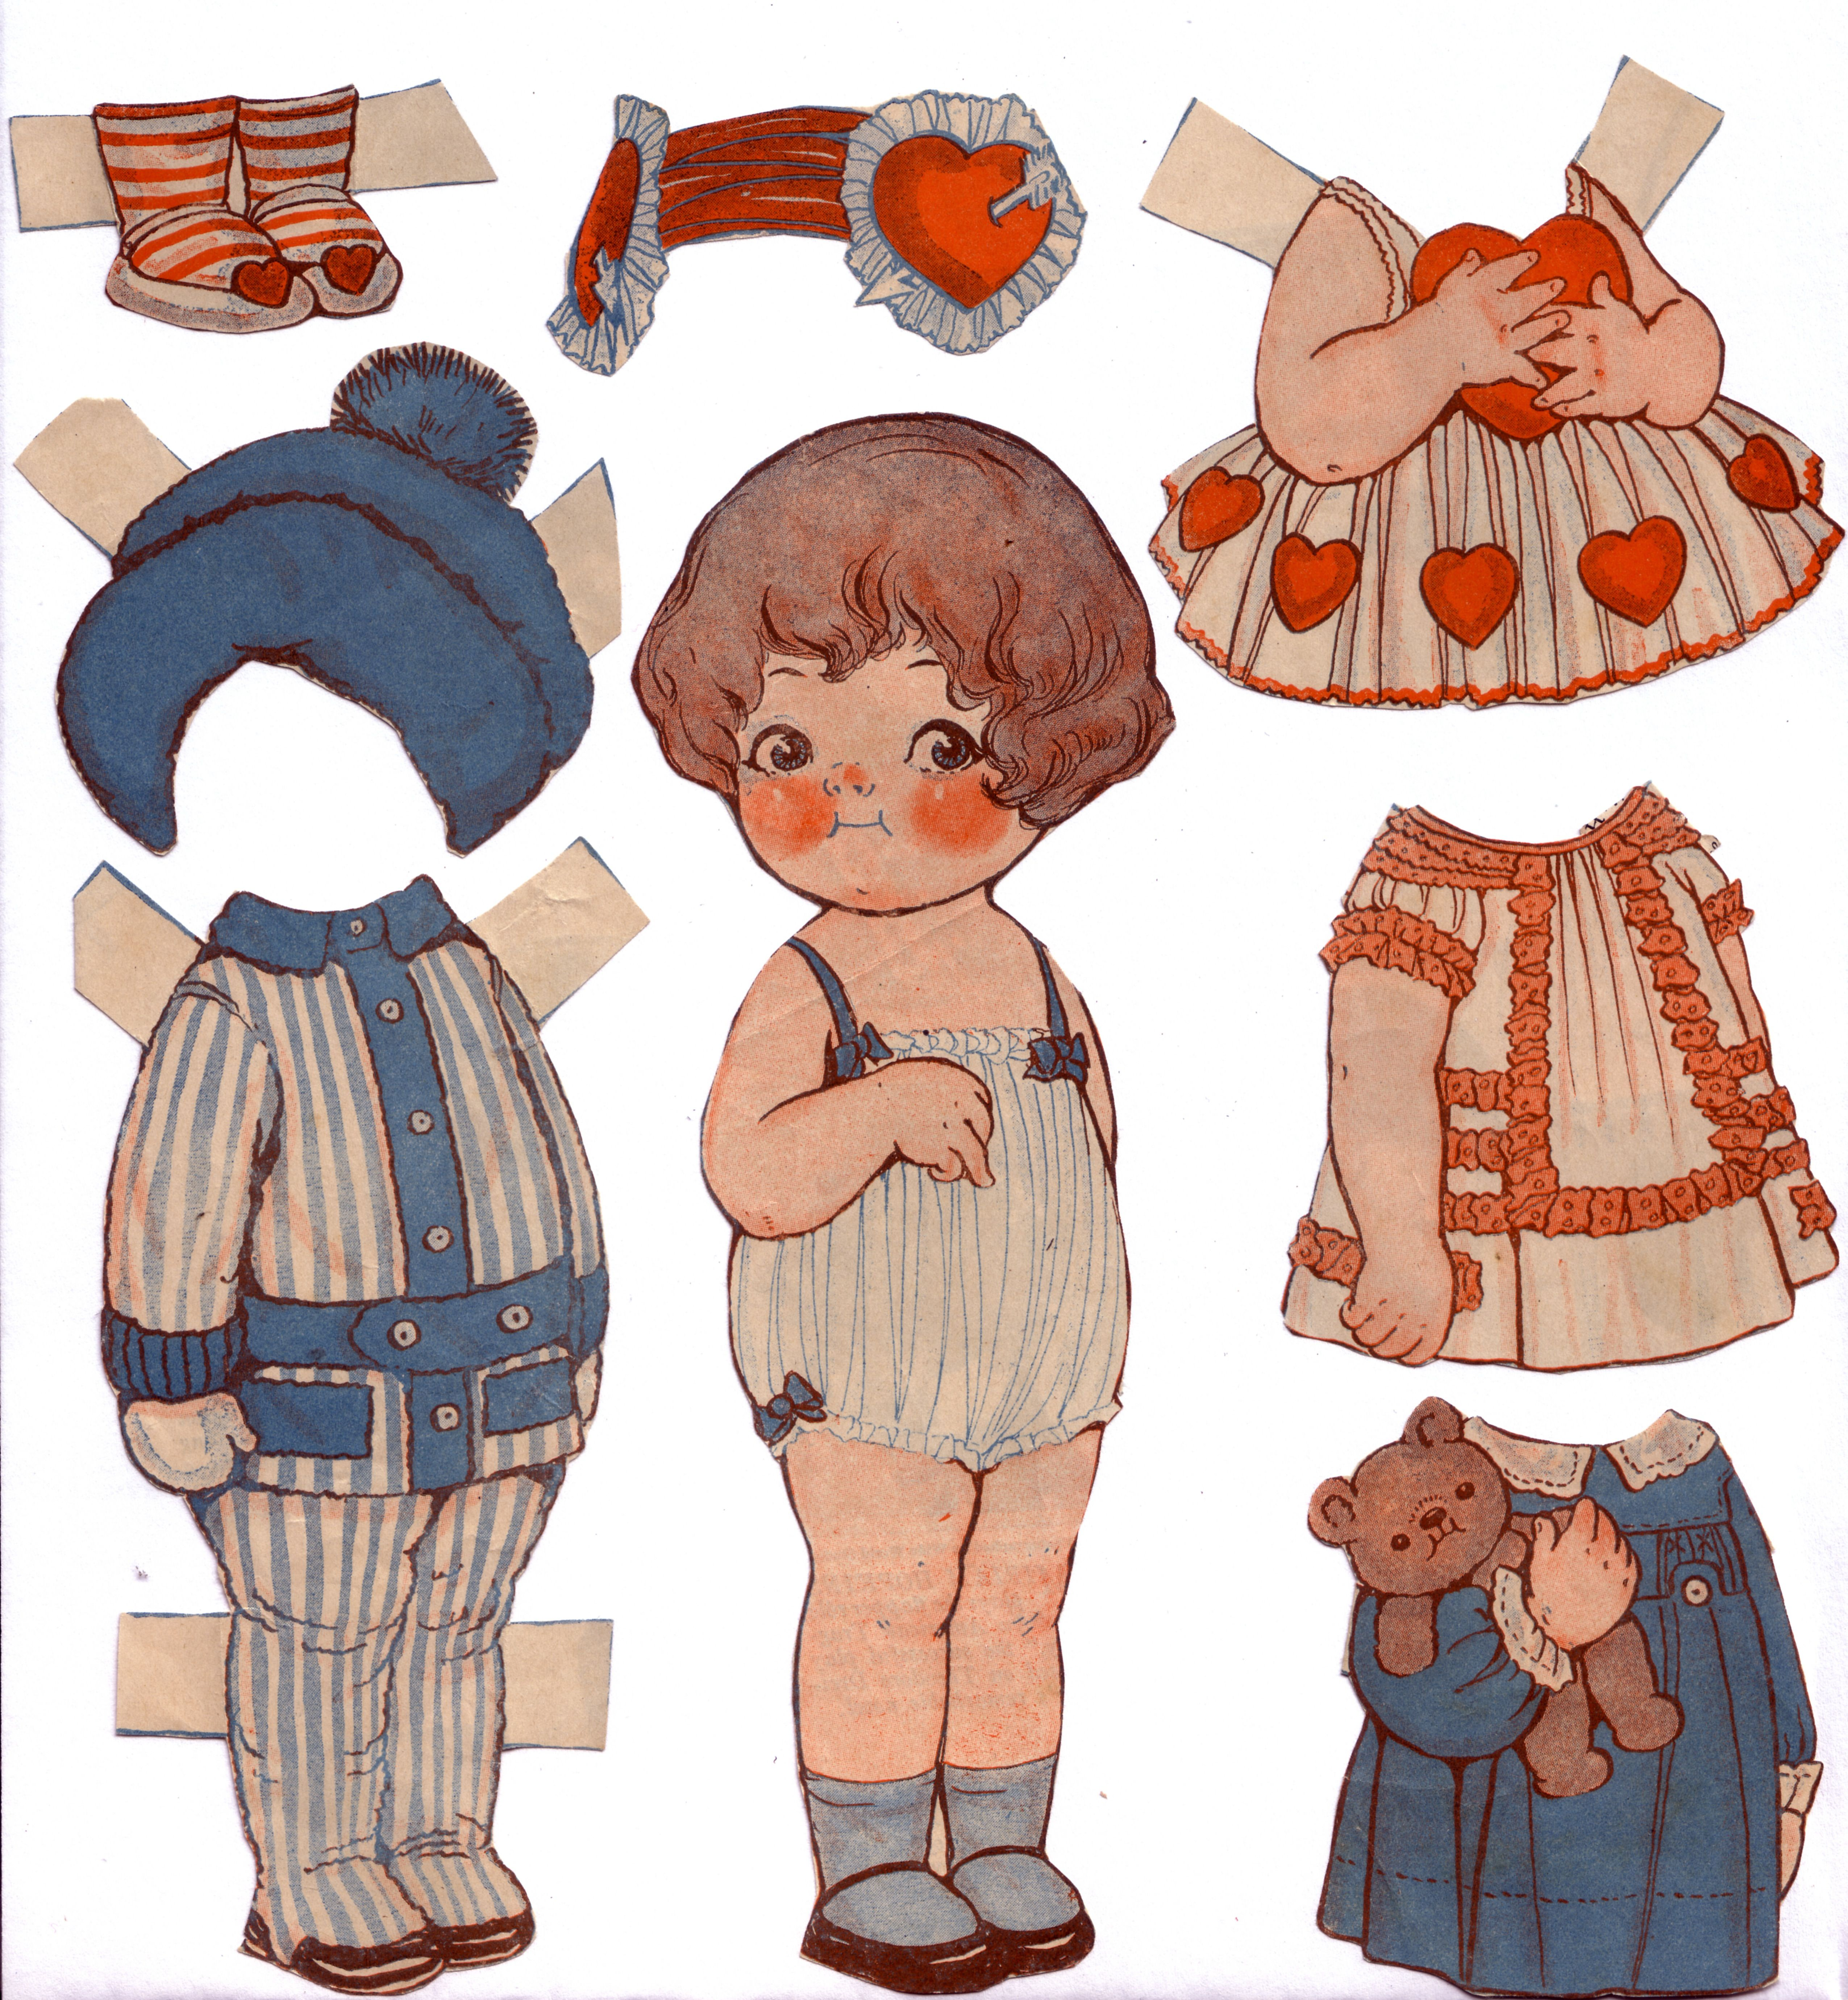 Dolly Dingle, Valentine 99009.16.10